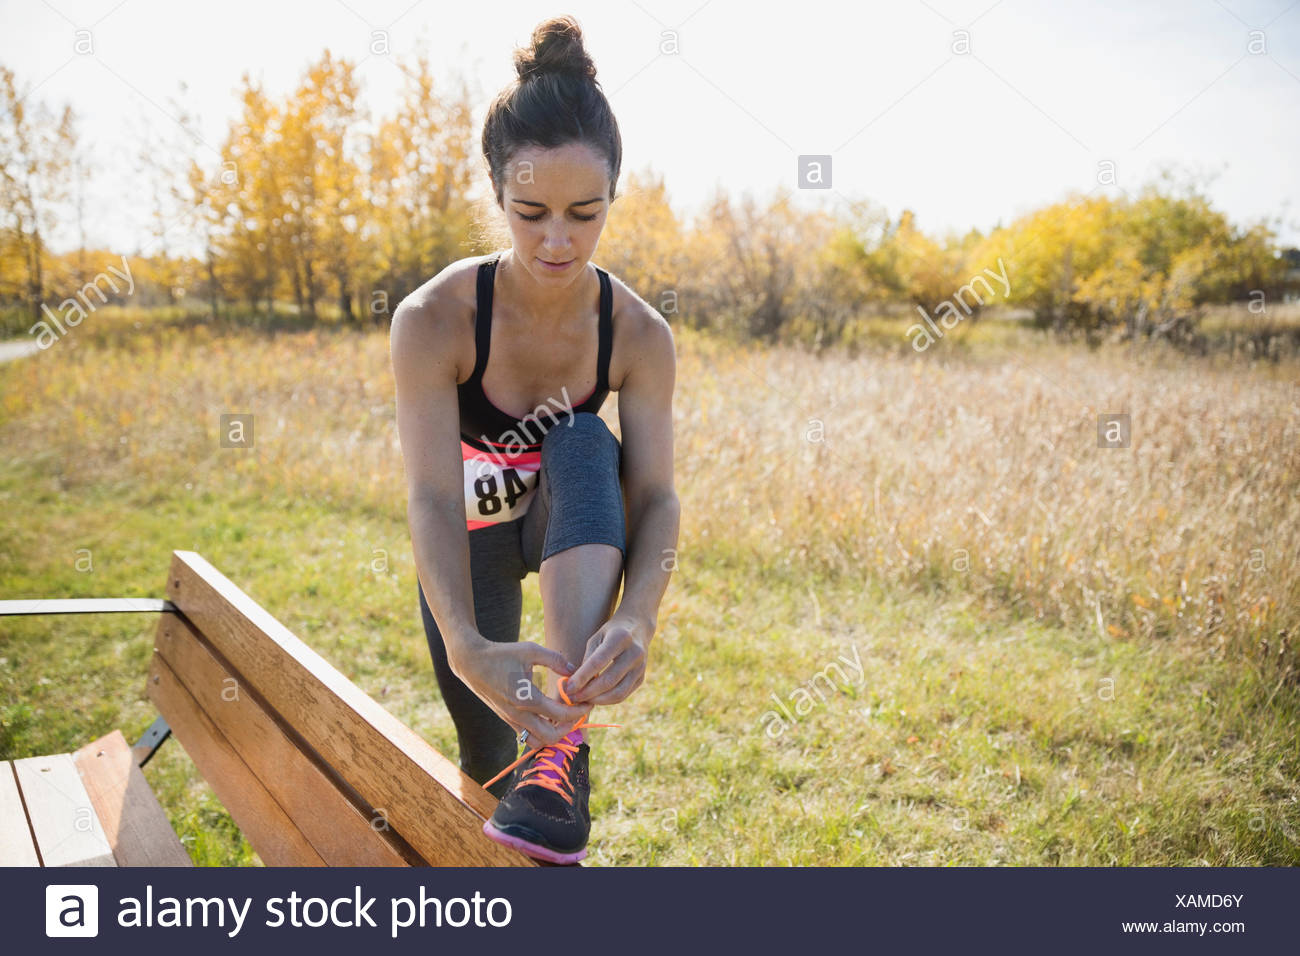 Jogger tying shoe on park bench - Stock Image